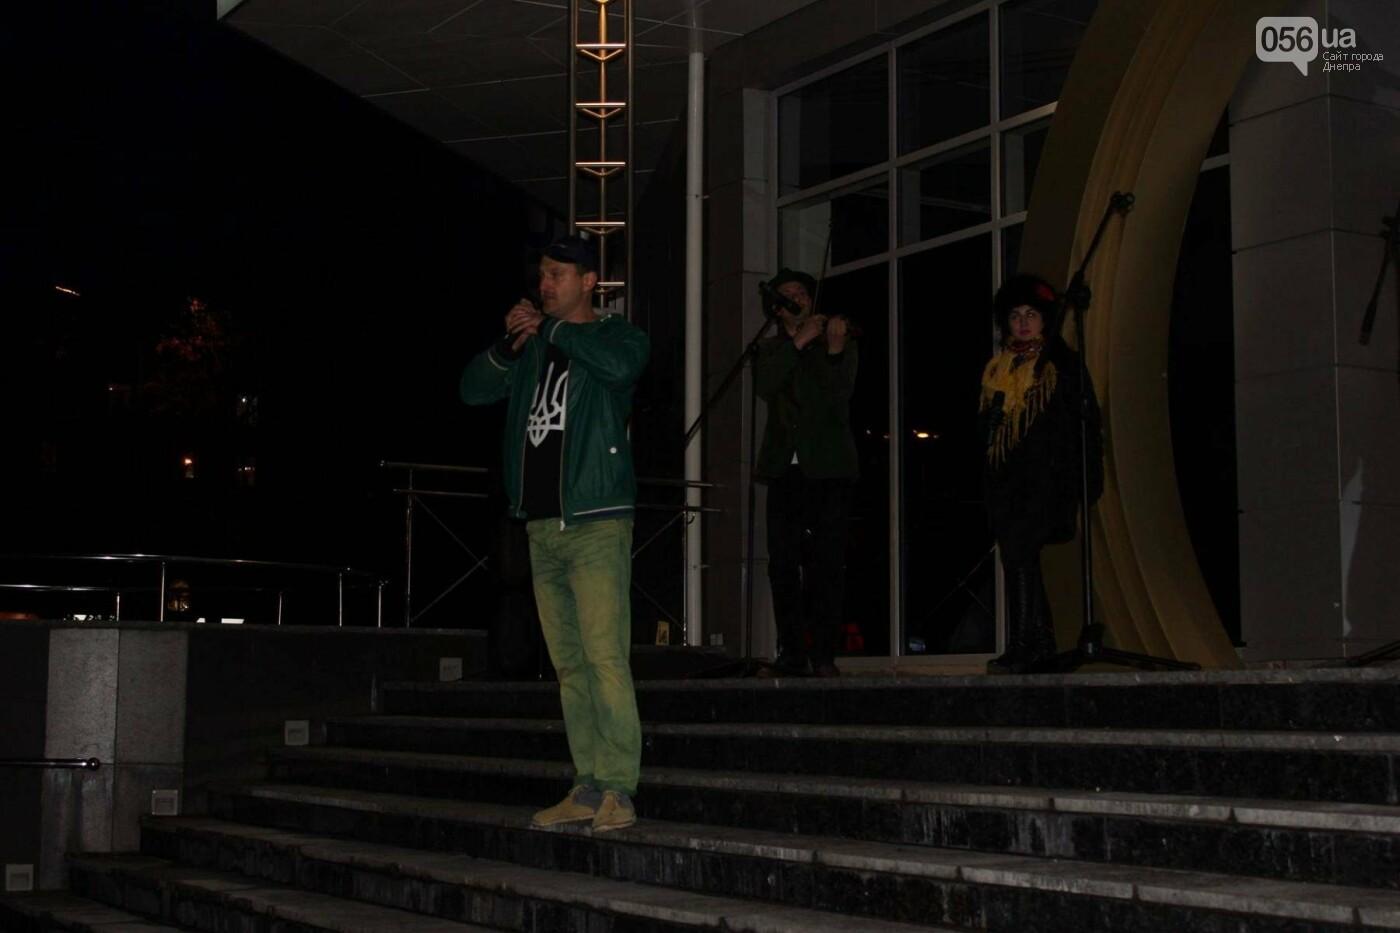 В центре Днепра прошла колонна добровольцев АТО (ФОТО, ВИДЕО), фото-12